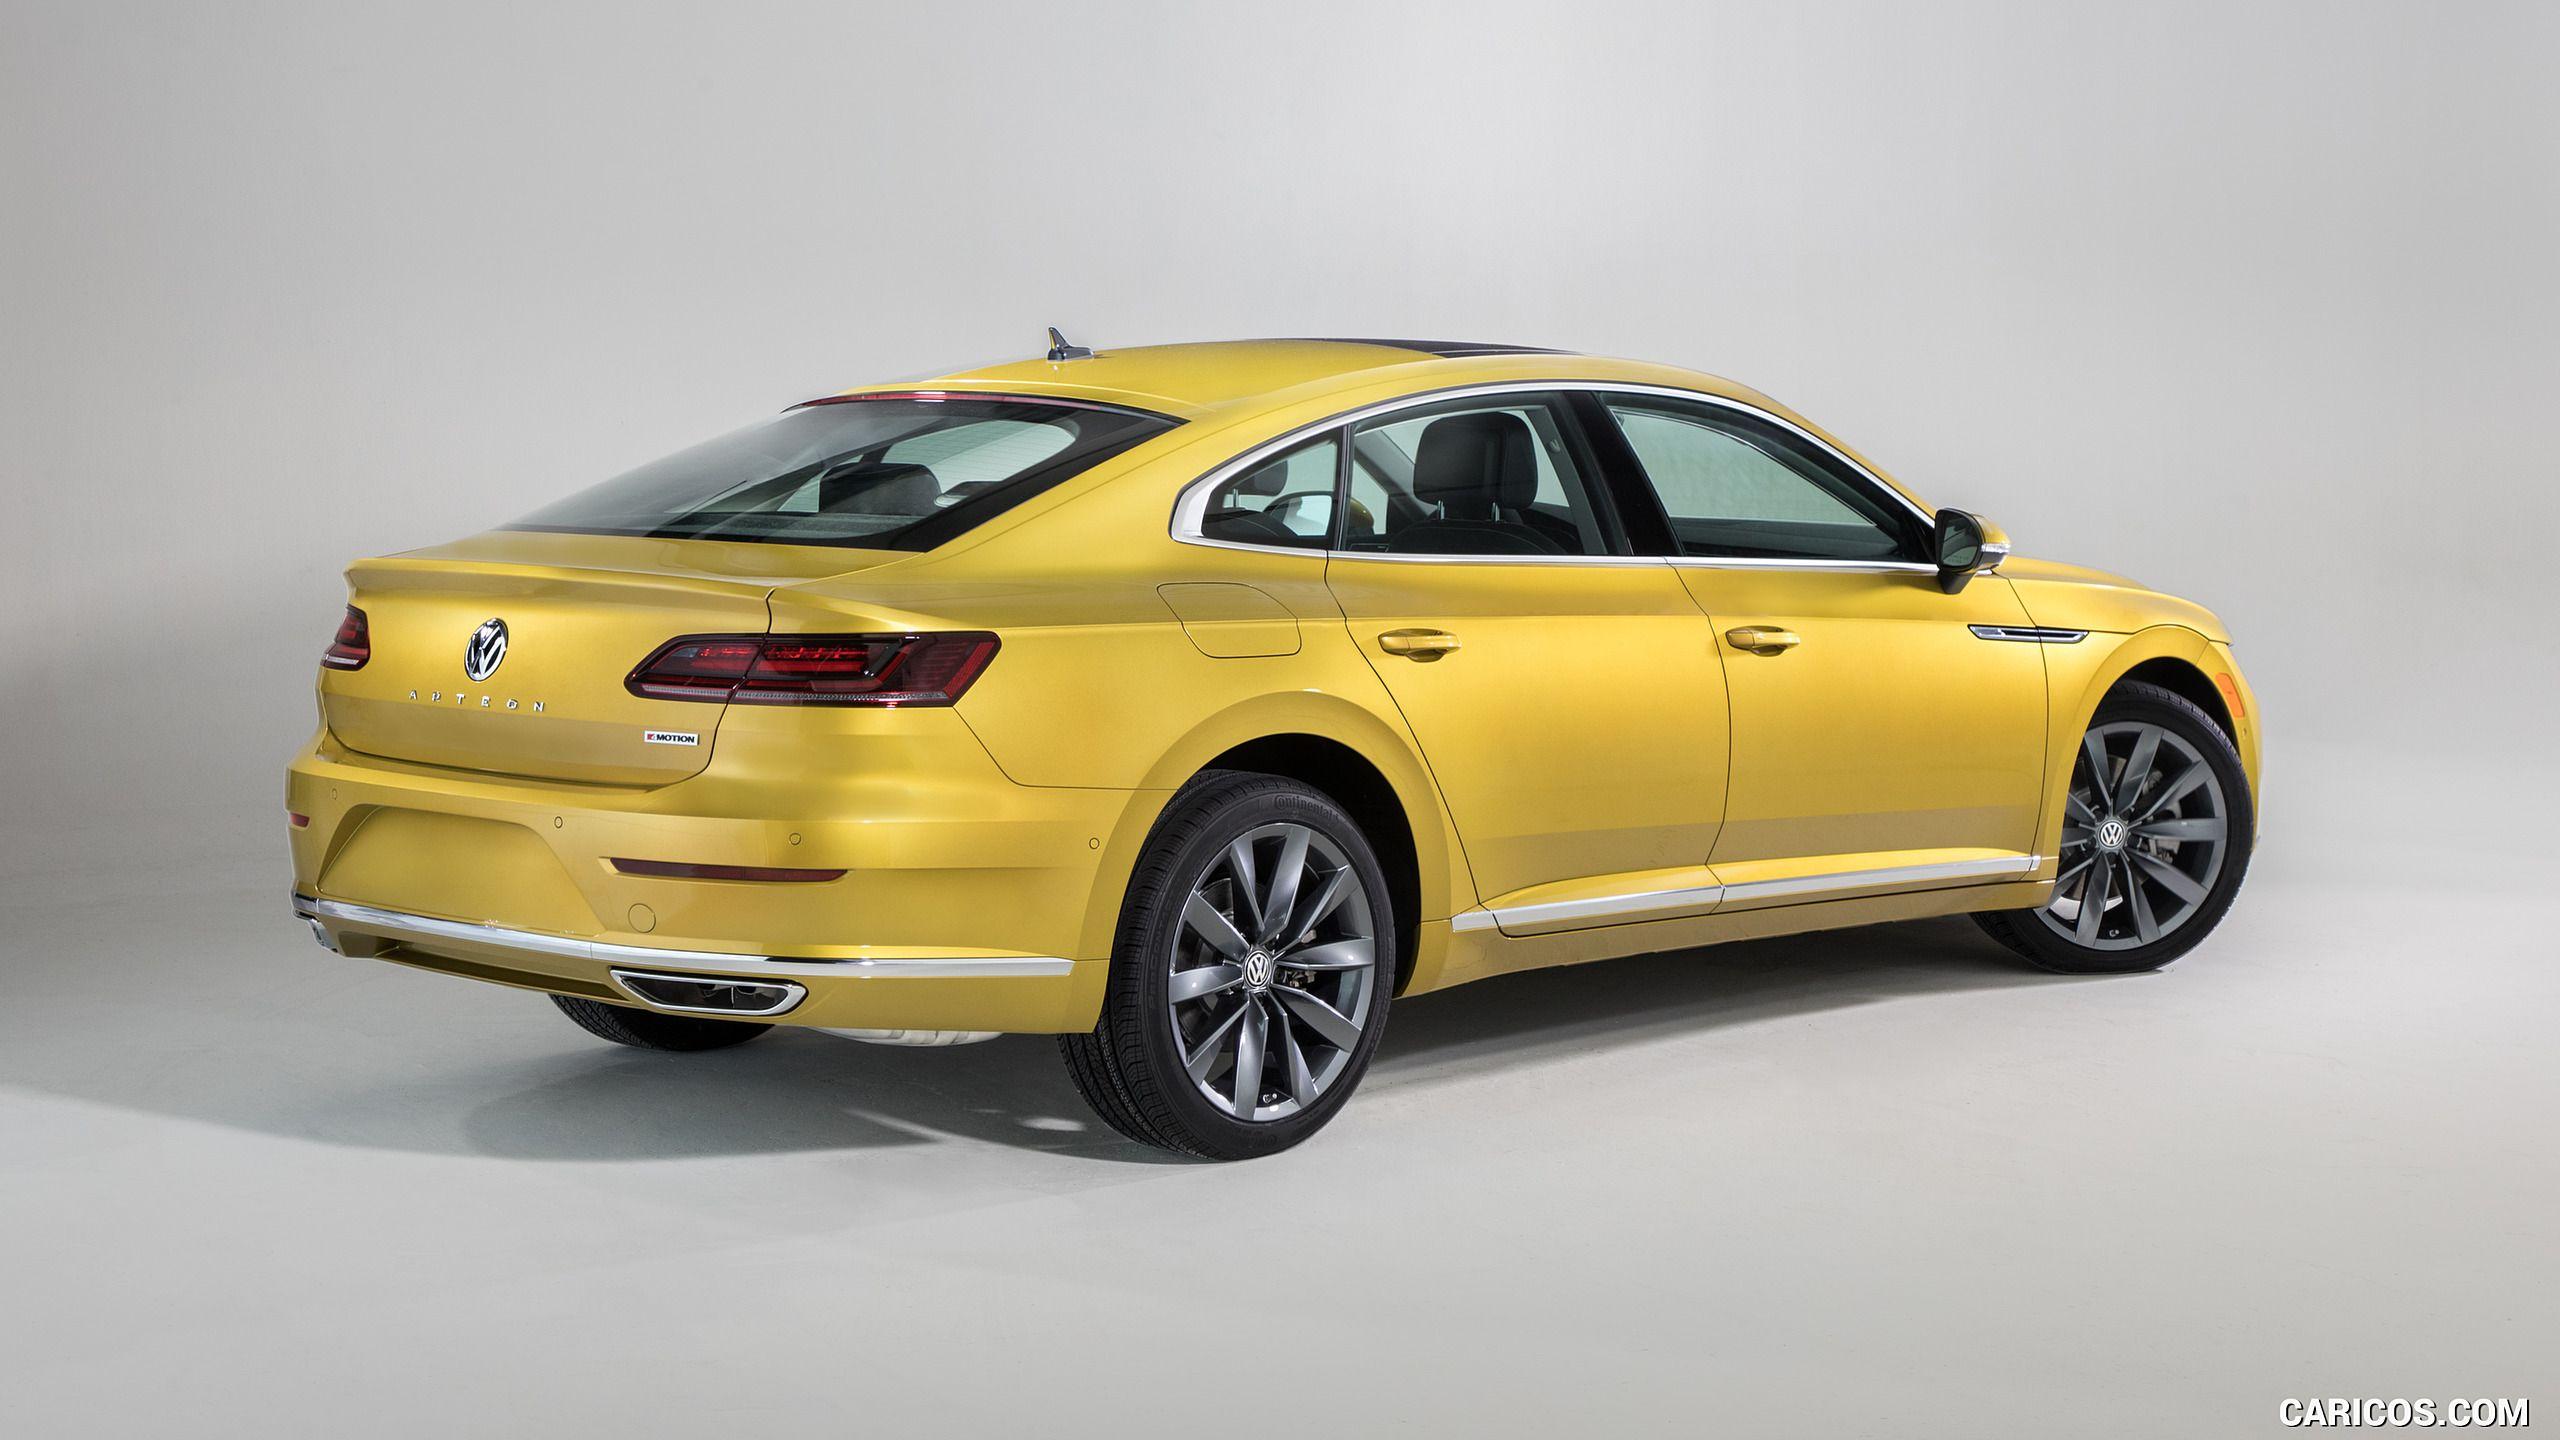 VW Arteon Usa >> 2019 Volkswagen Arteon Us Spec Rear Three Quarter Hd